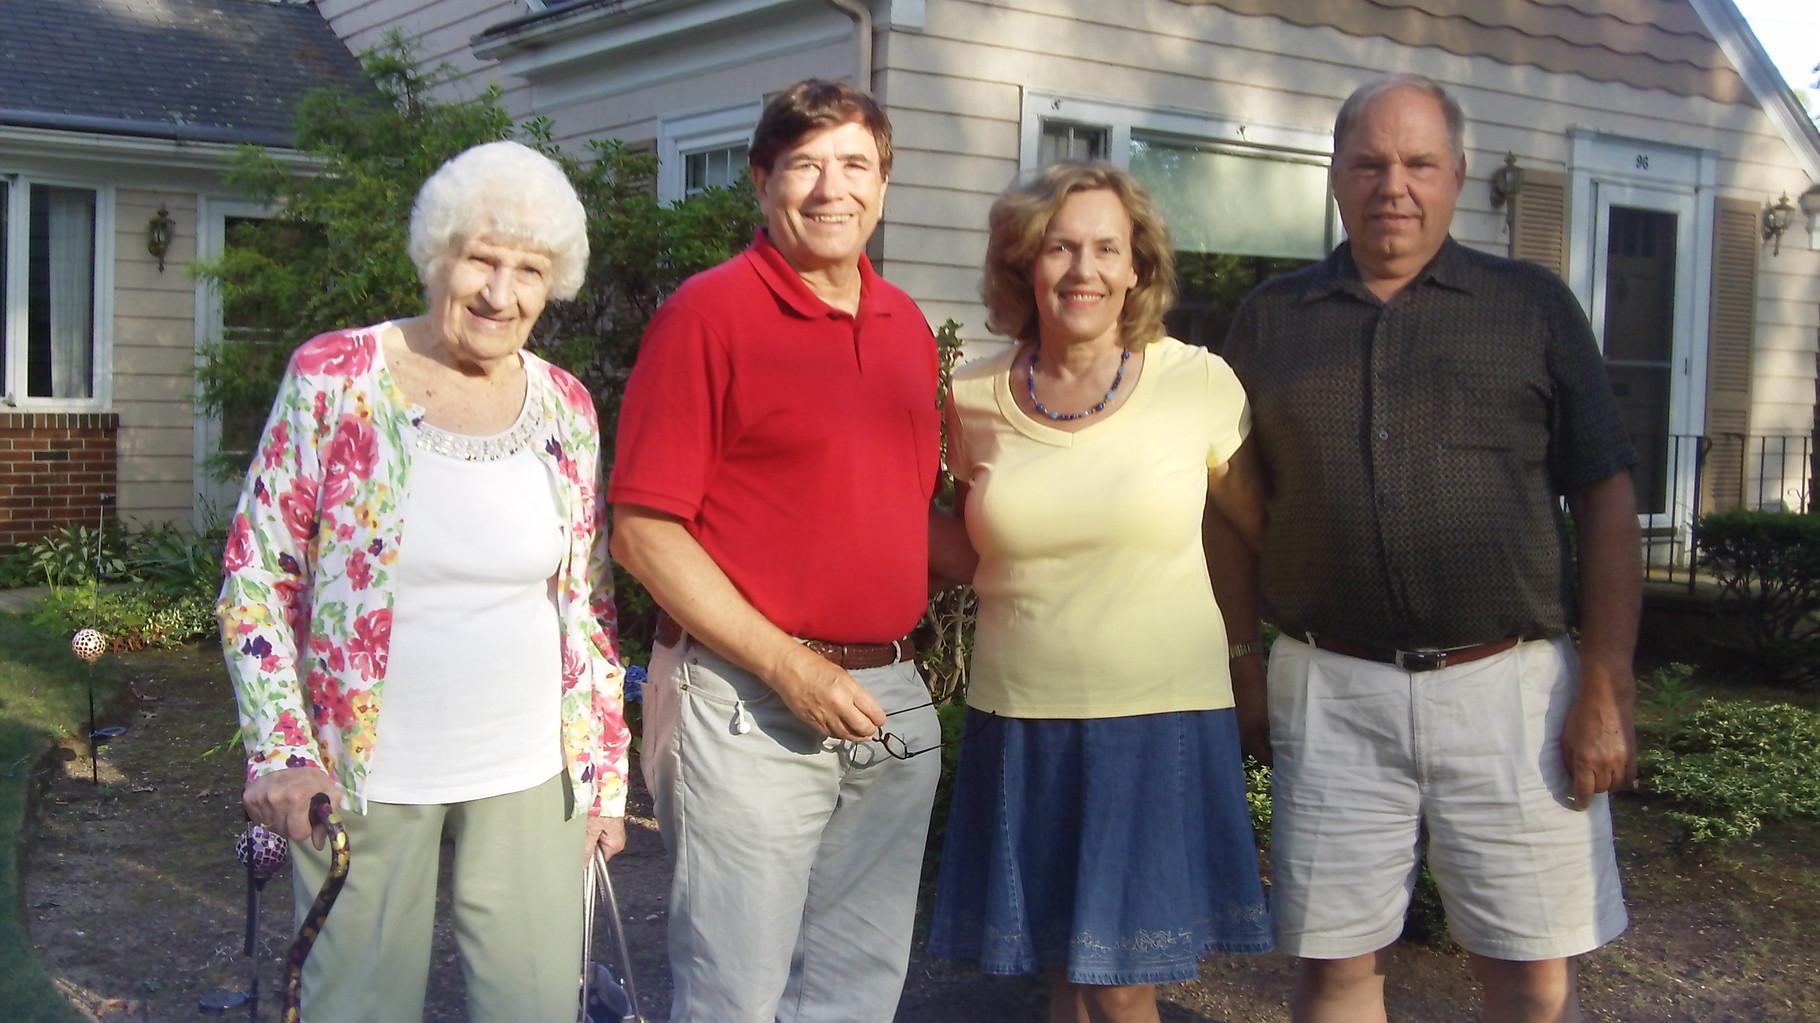 Detta, John, Lorraine, and Tom August, 2015 Pawtucket, RI